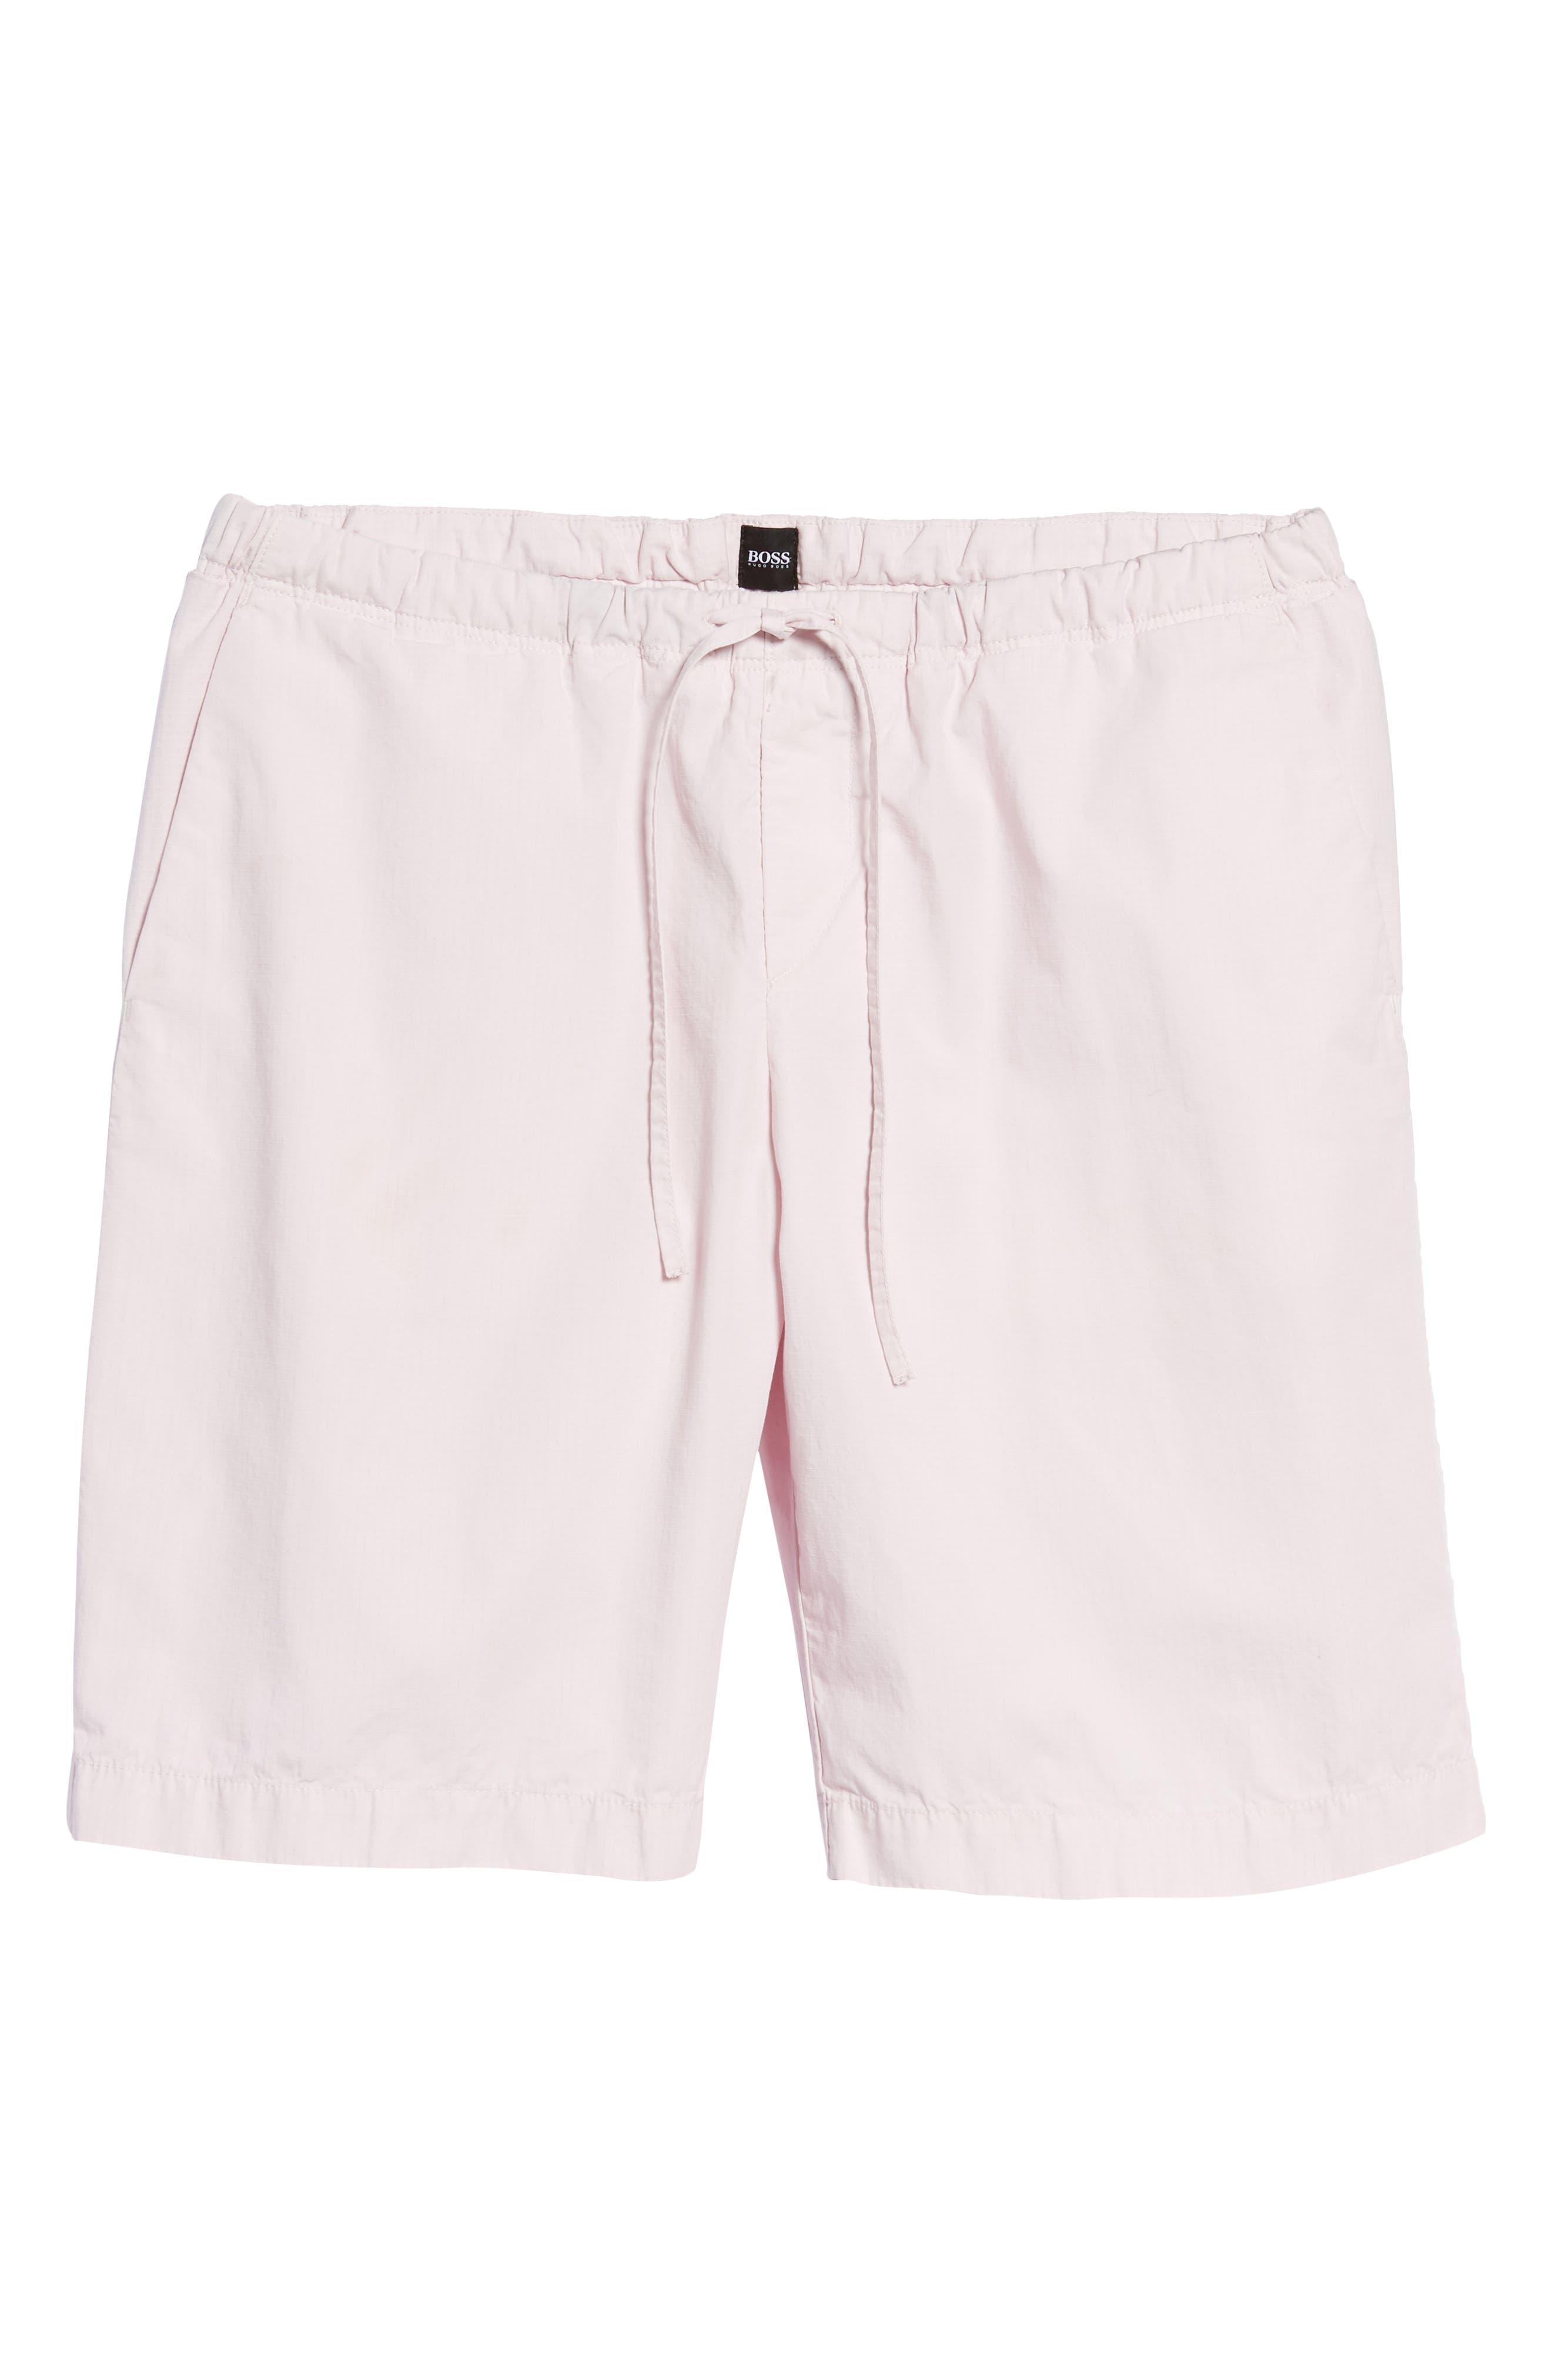 Passeo Cotton Shorts,                             Alternate thumbnail 6, color,                             Pink